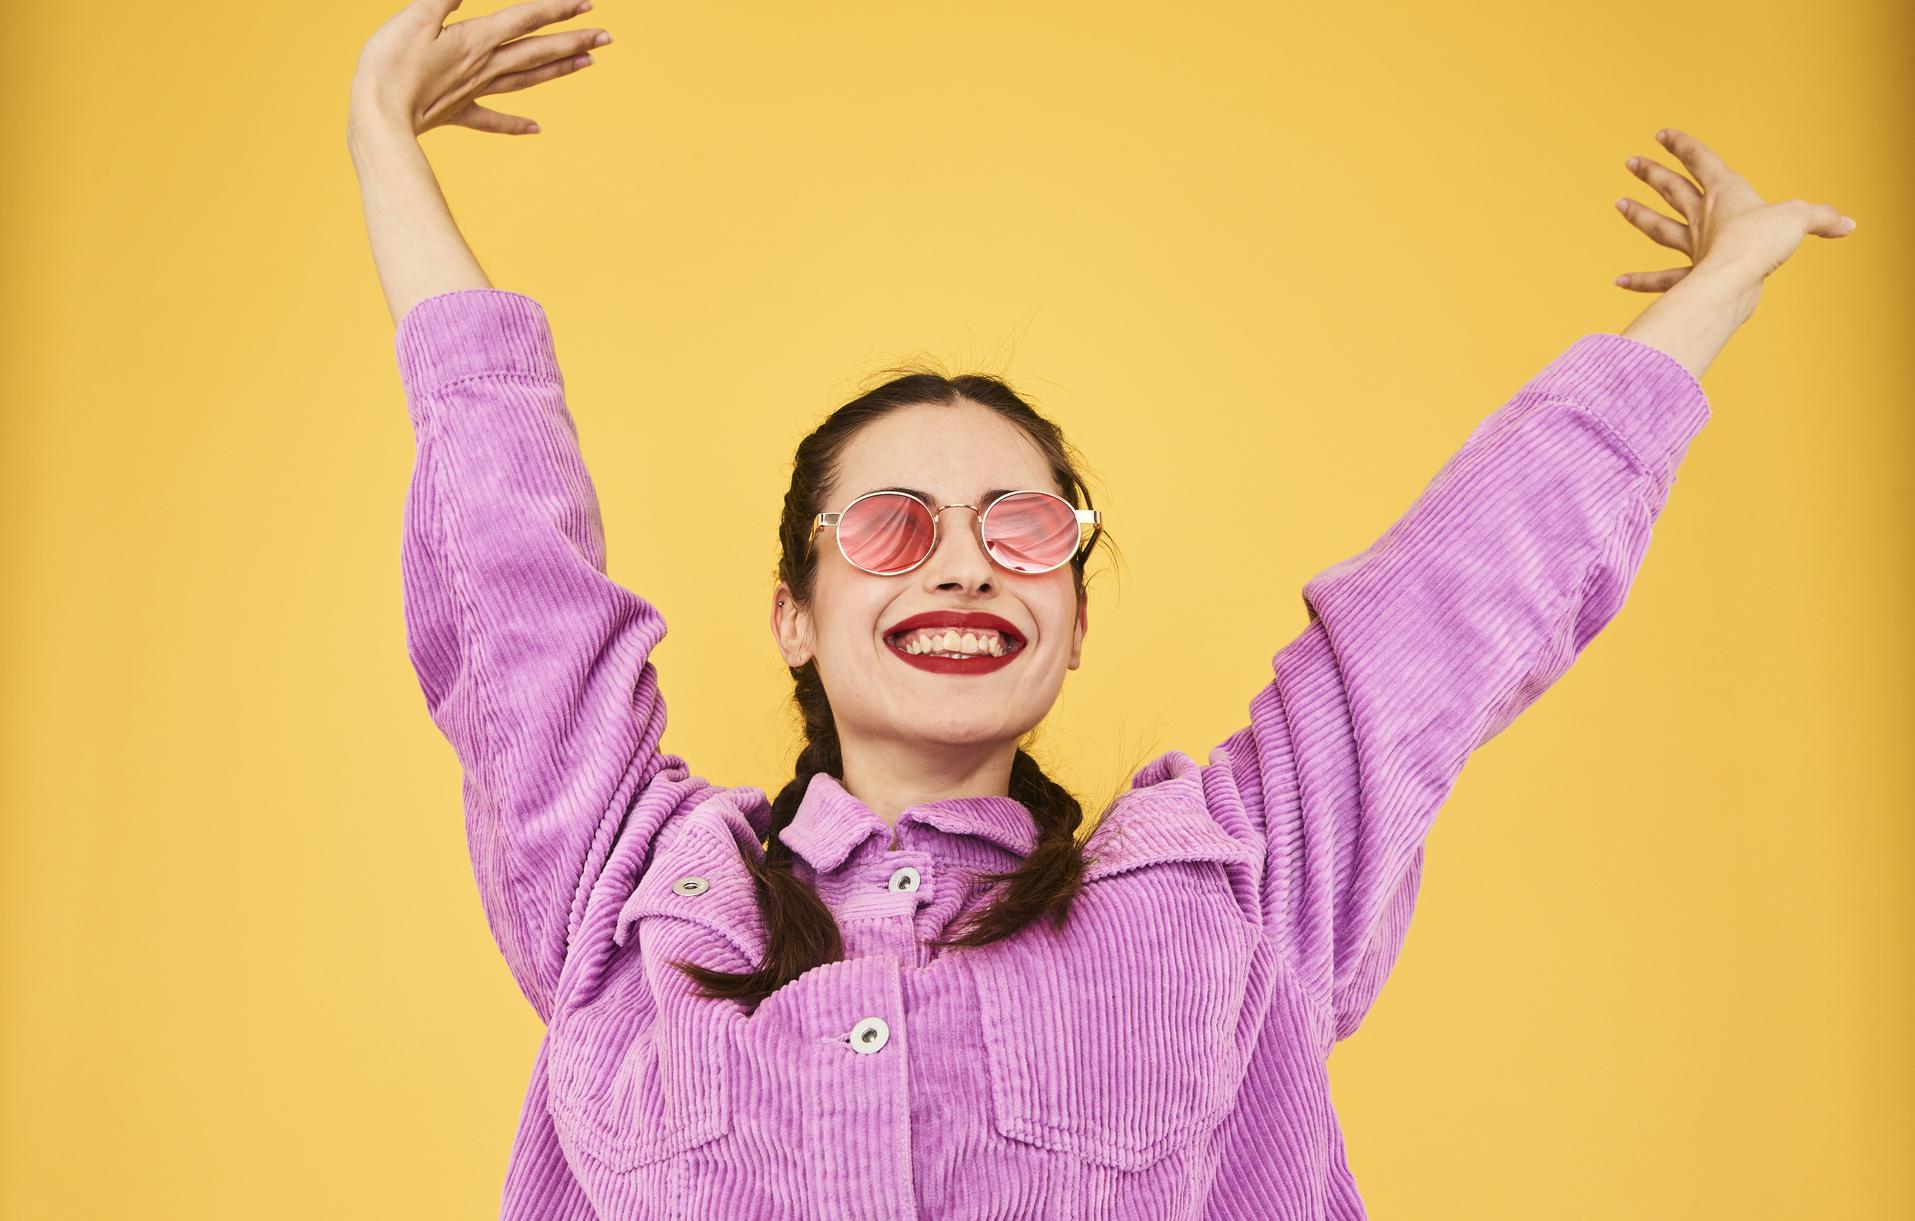 eletmod-boldogsag-tippek-meditacio-tudatos-legzes-zene-tanc-produktivitas-mindfulness